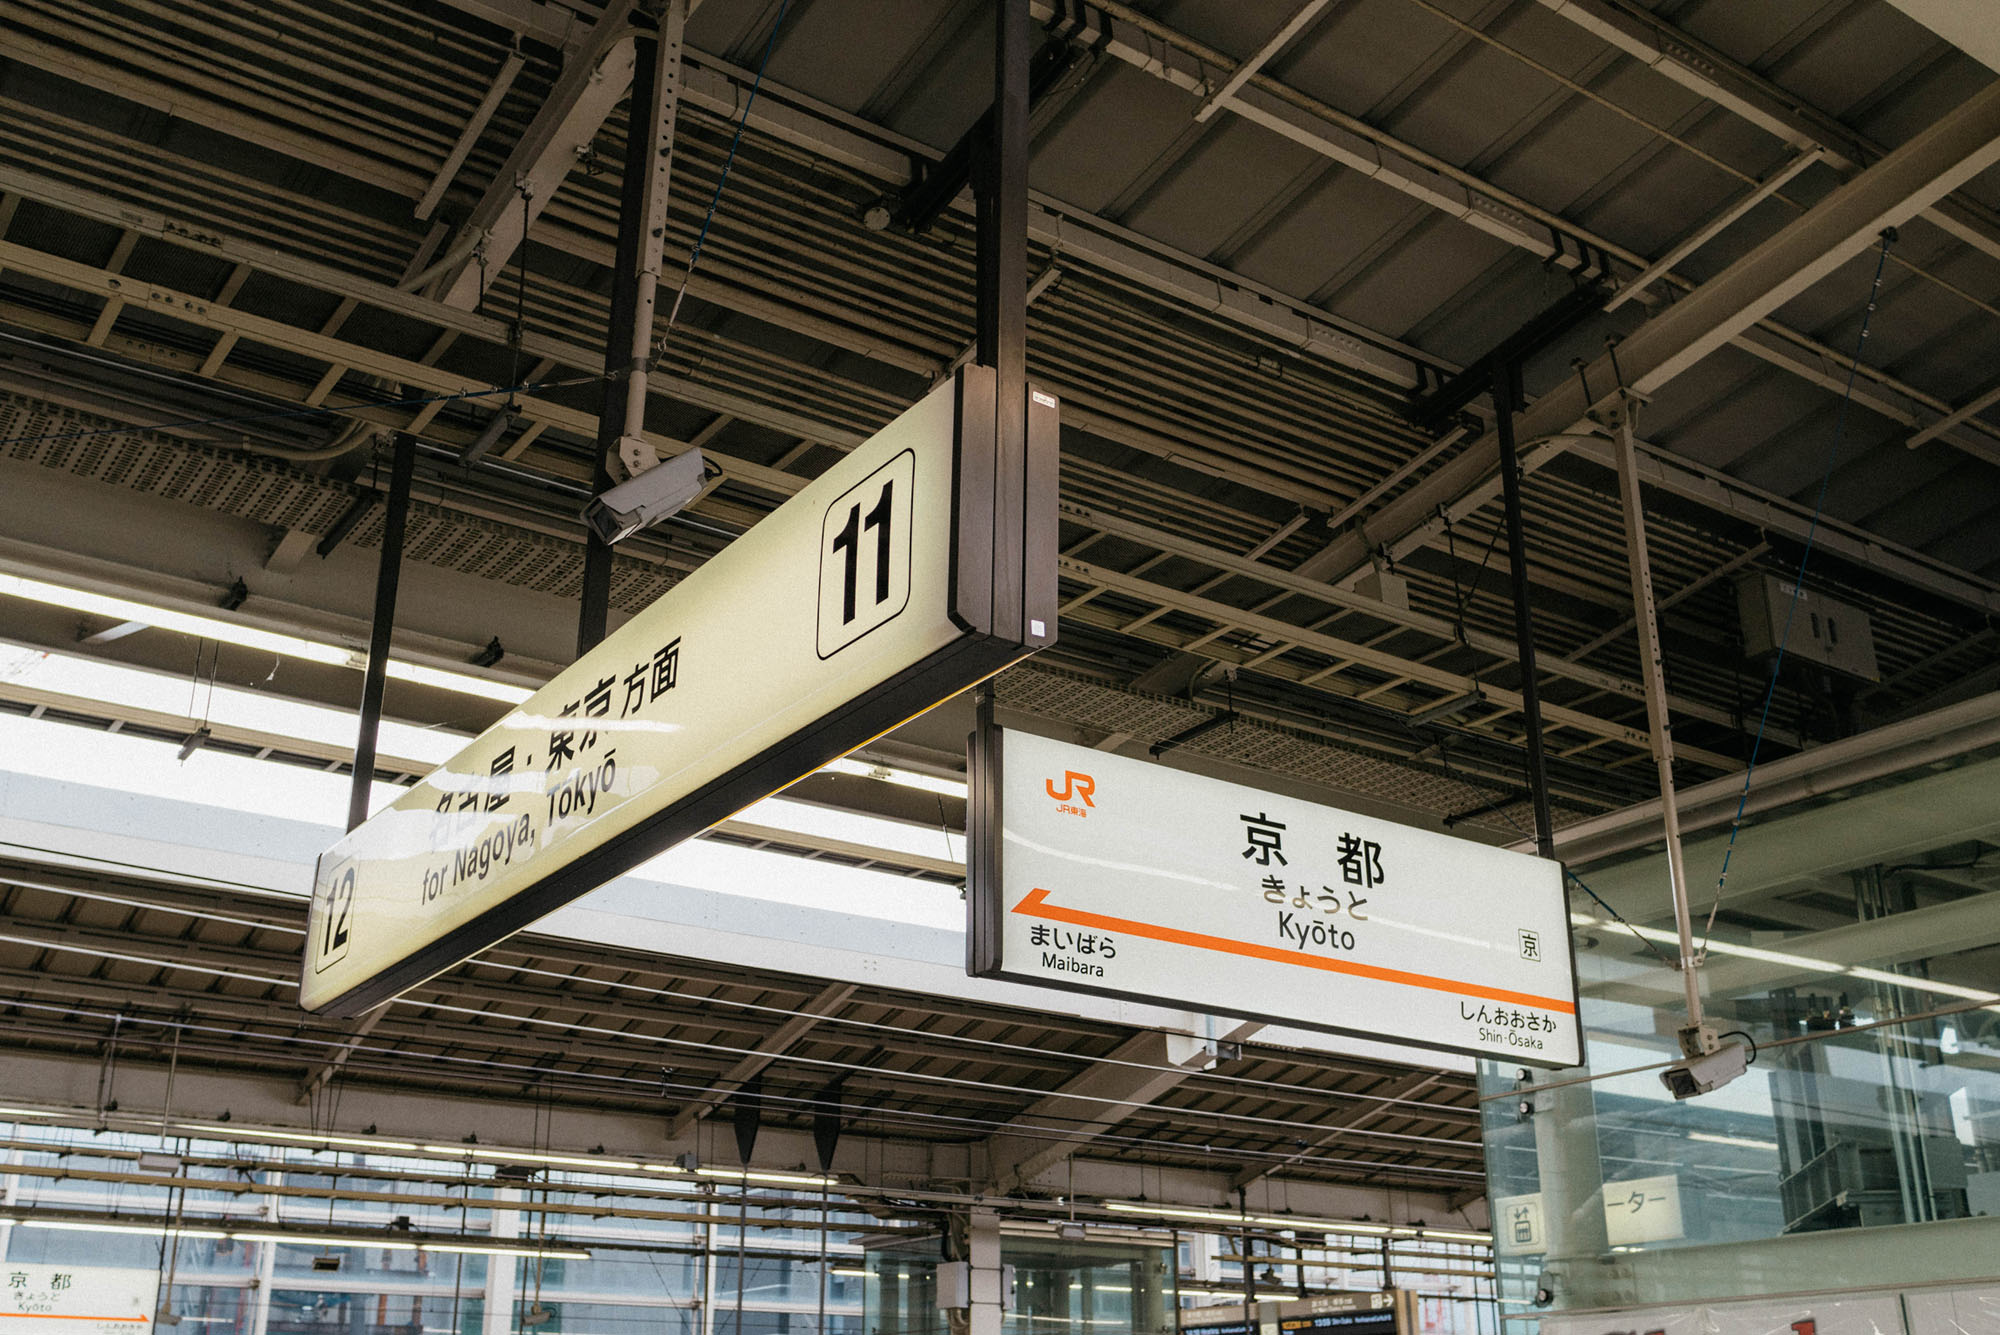 Taking the  Shinkansen  (bullet train) to Tokyo!